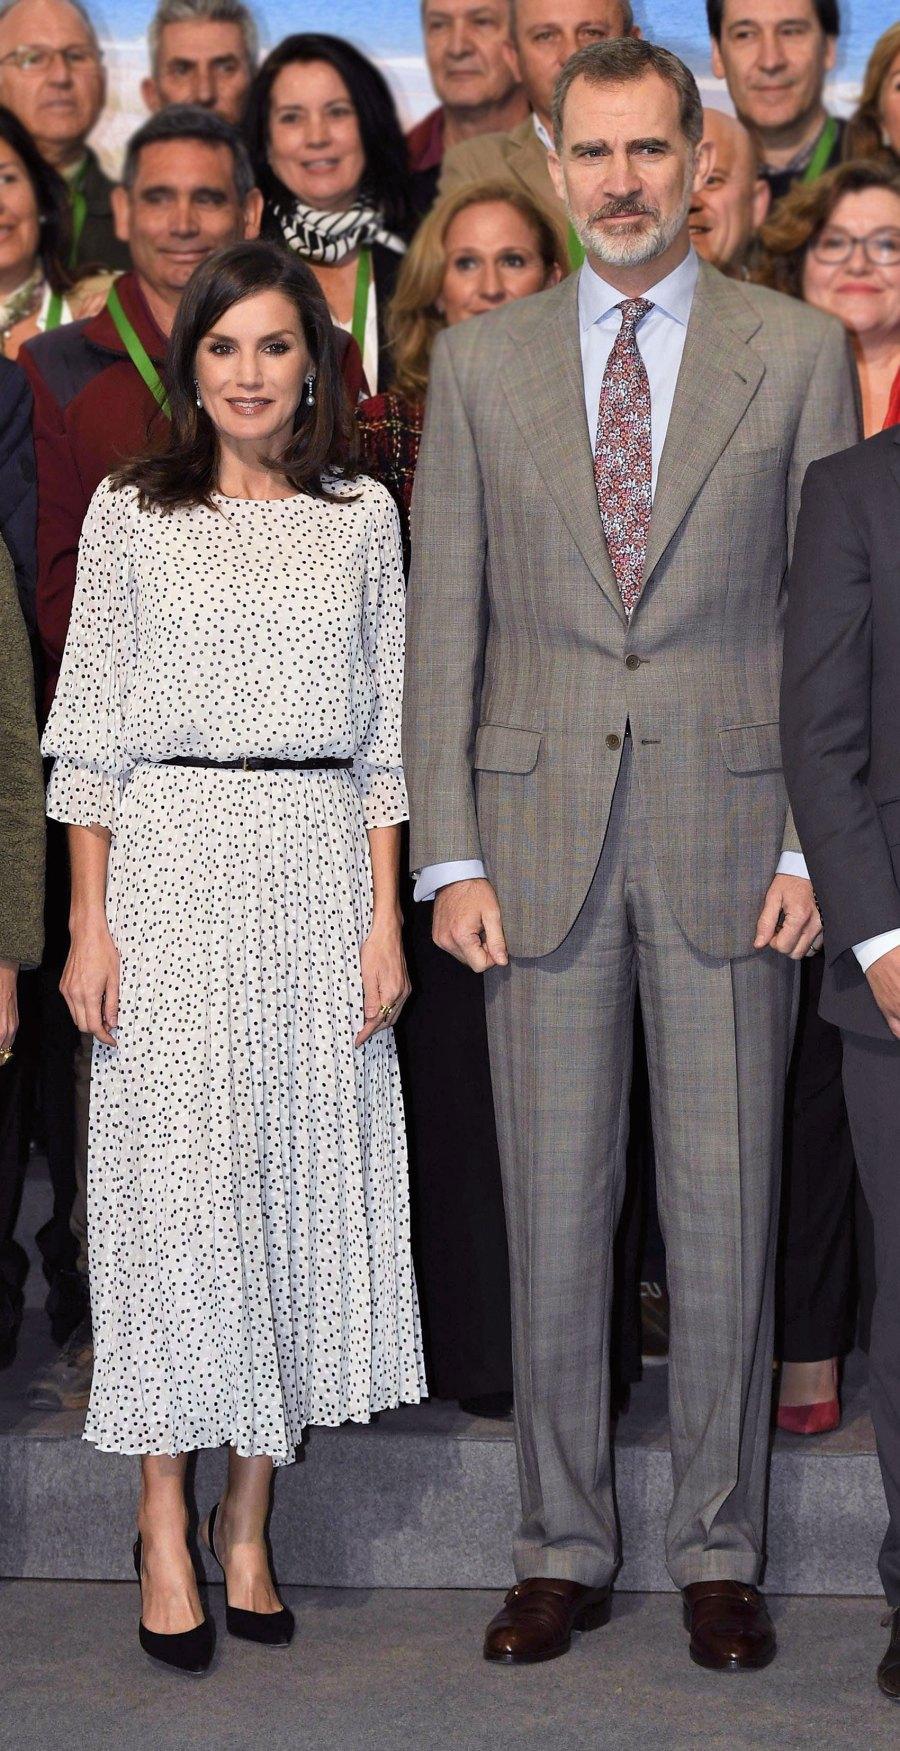 Queen Letizia Polka-Dot Dress February 14, 2020